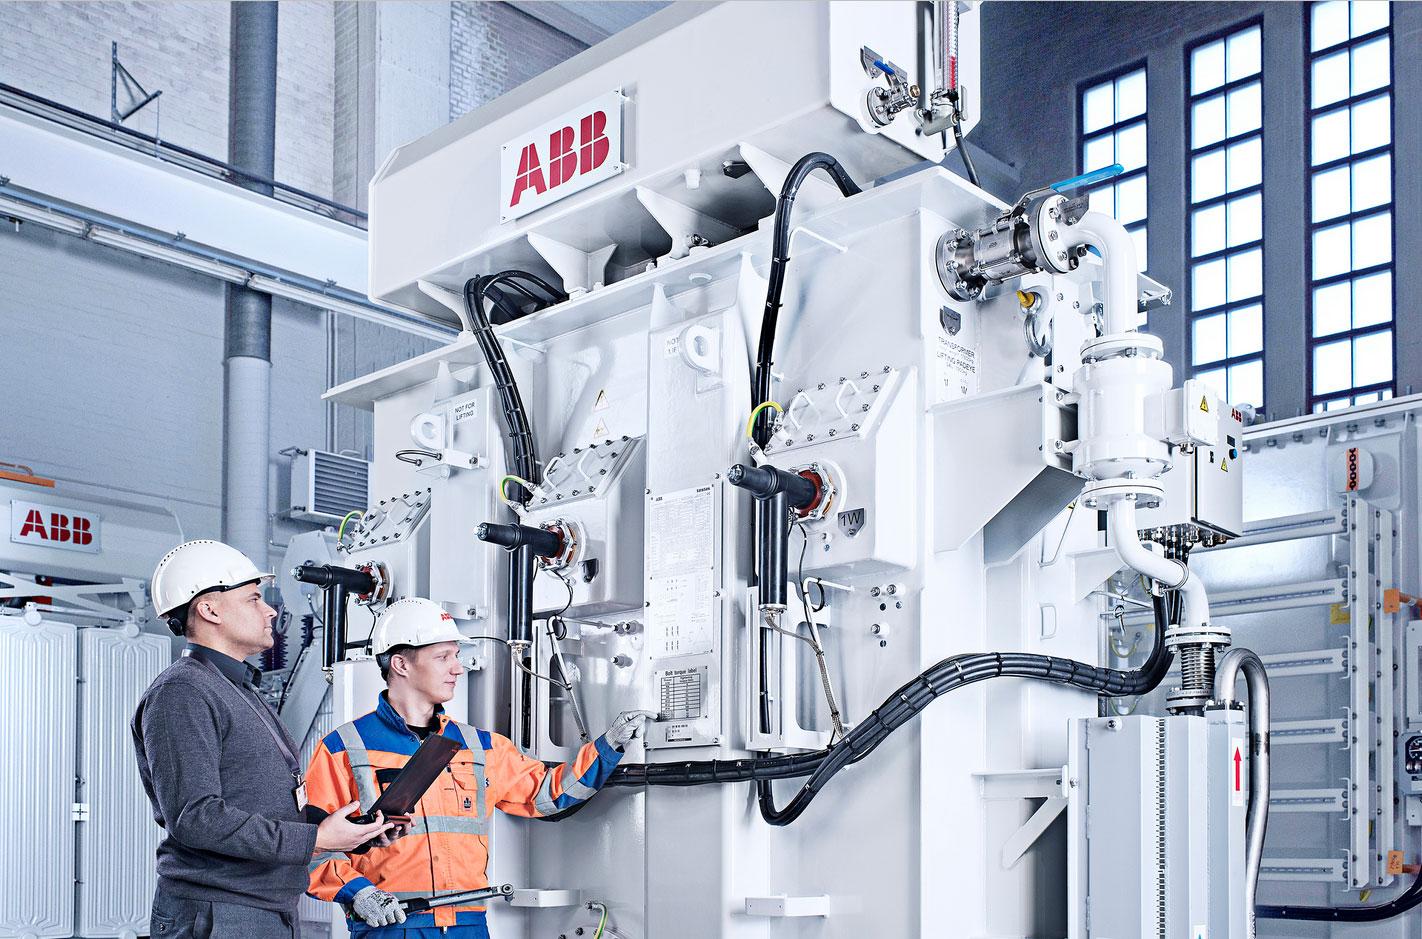 ABB transformer / Pressebild: ABB